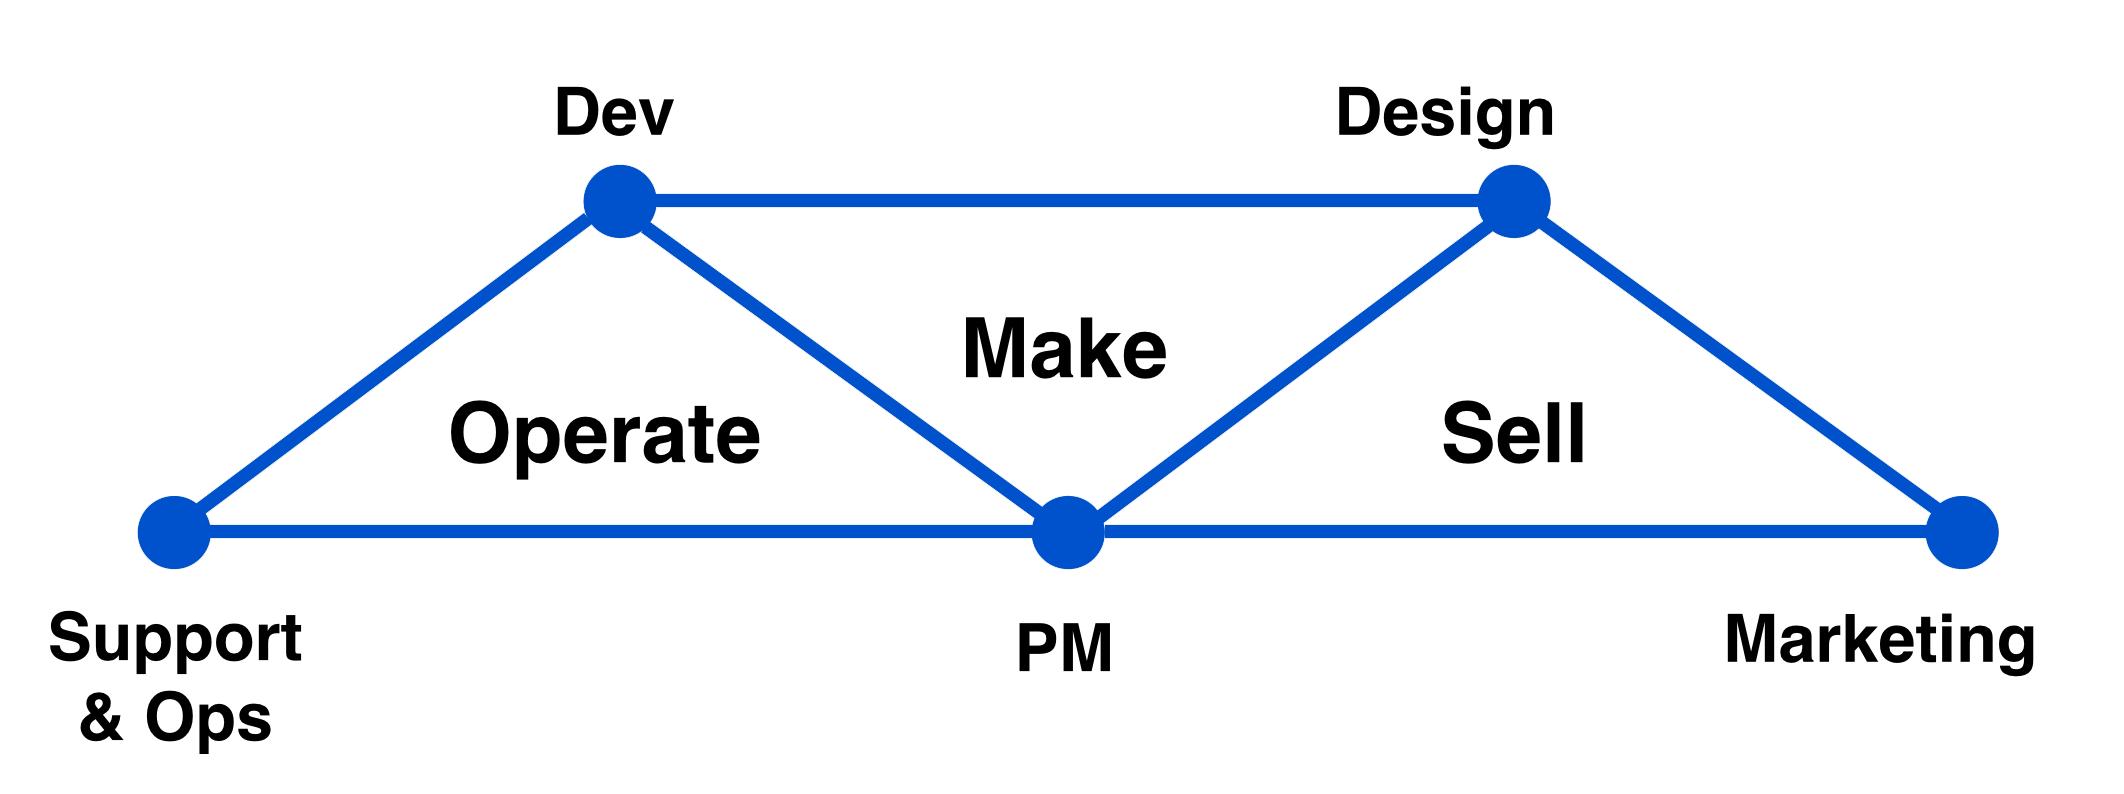 Tríades de equipe Atlassian | Coach Agile Atlassian